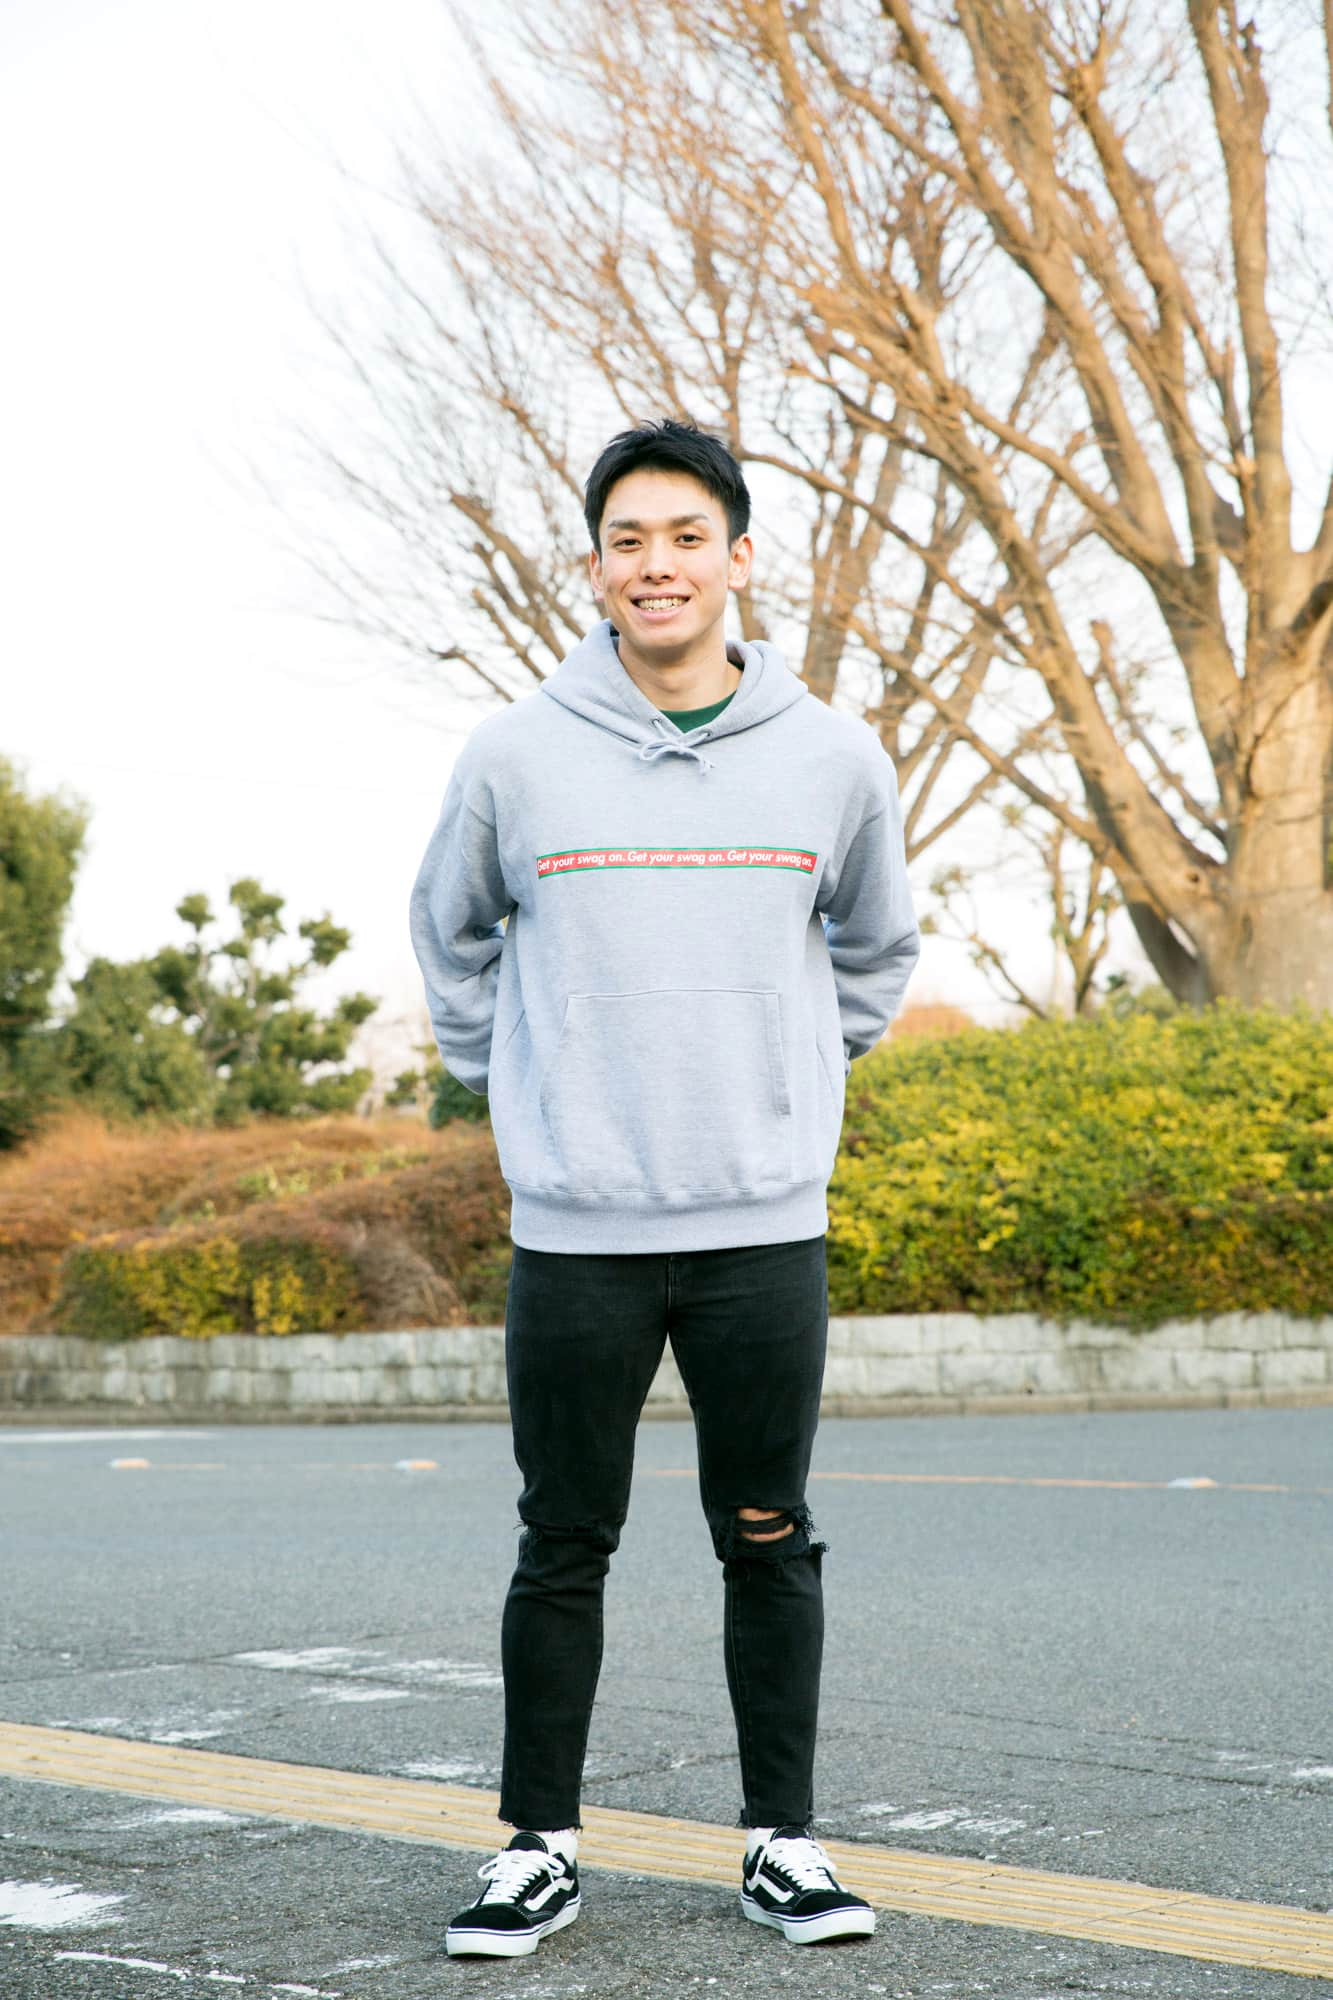 <Bリーグ×ファッションの密な関係 Vol.2>サンロッカーズ渋谷:伊藤駿選手「普段はバッシュ履かない」